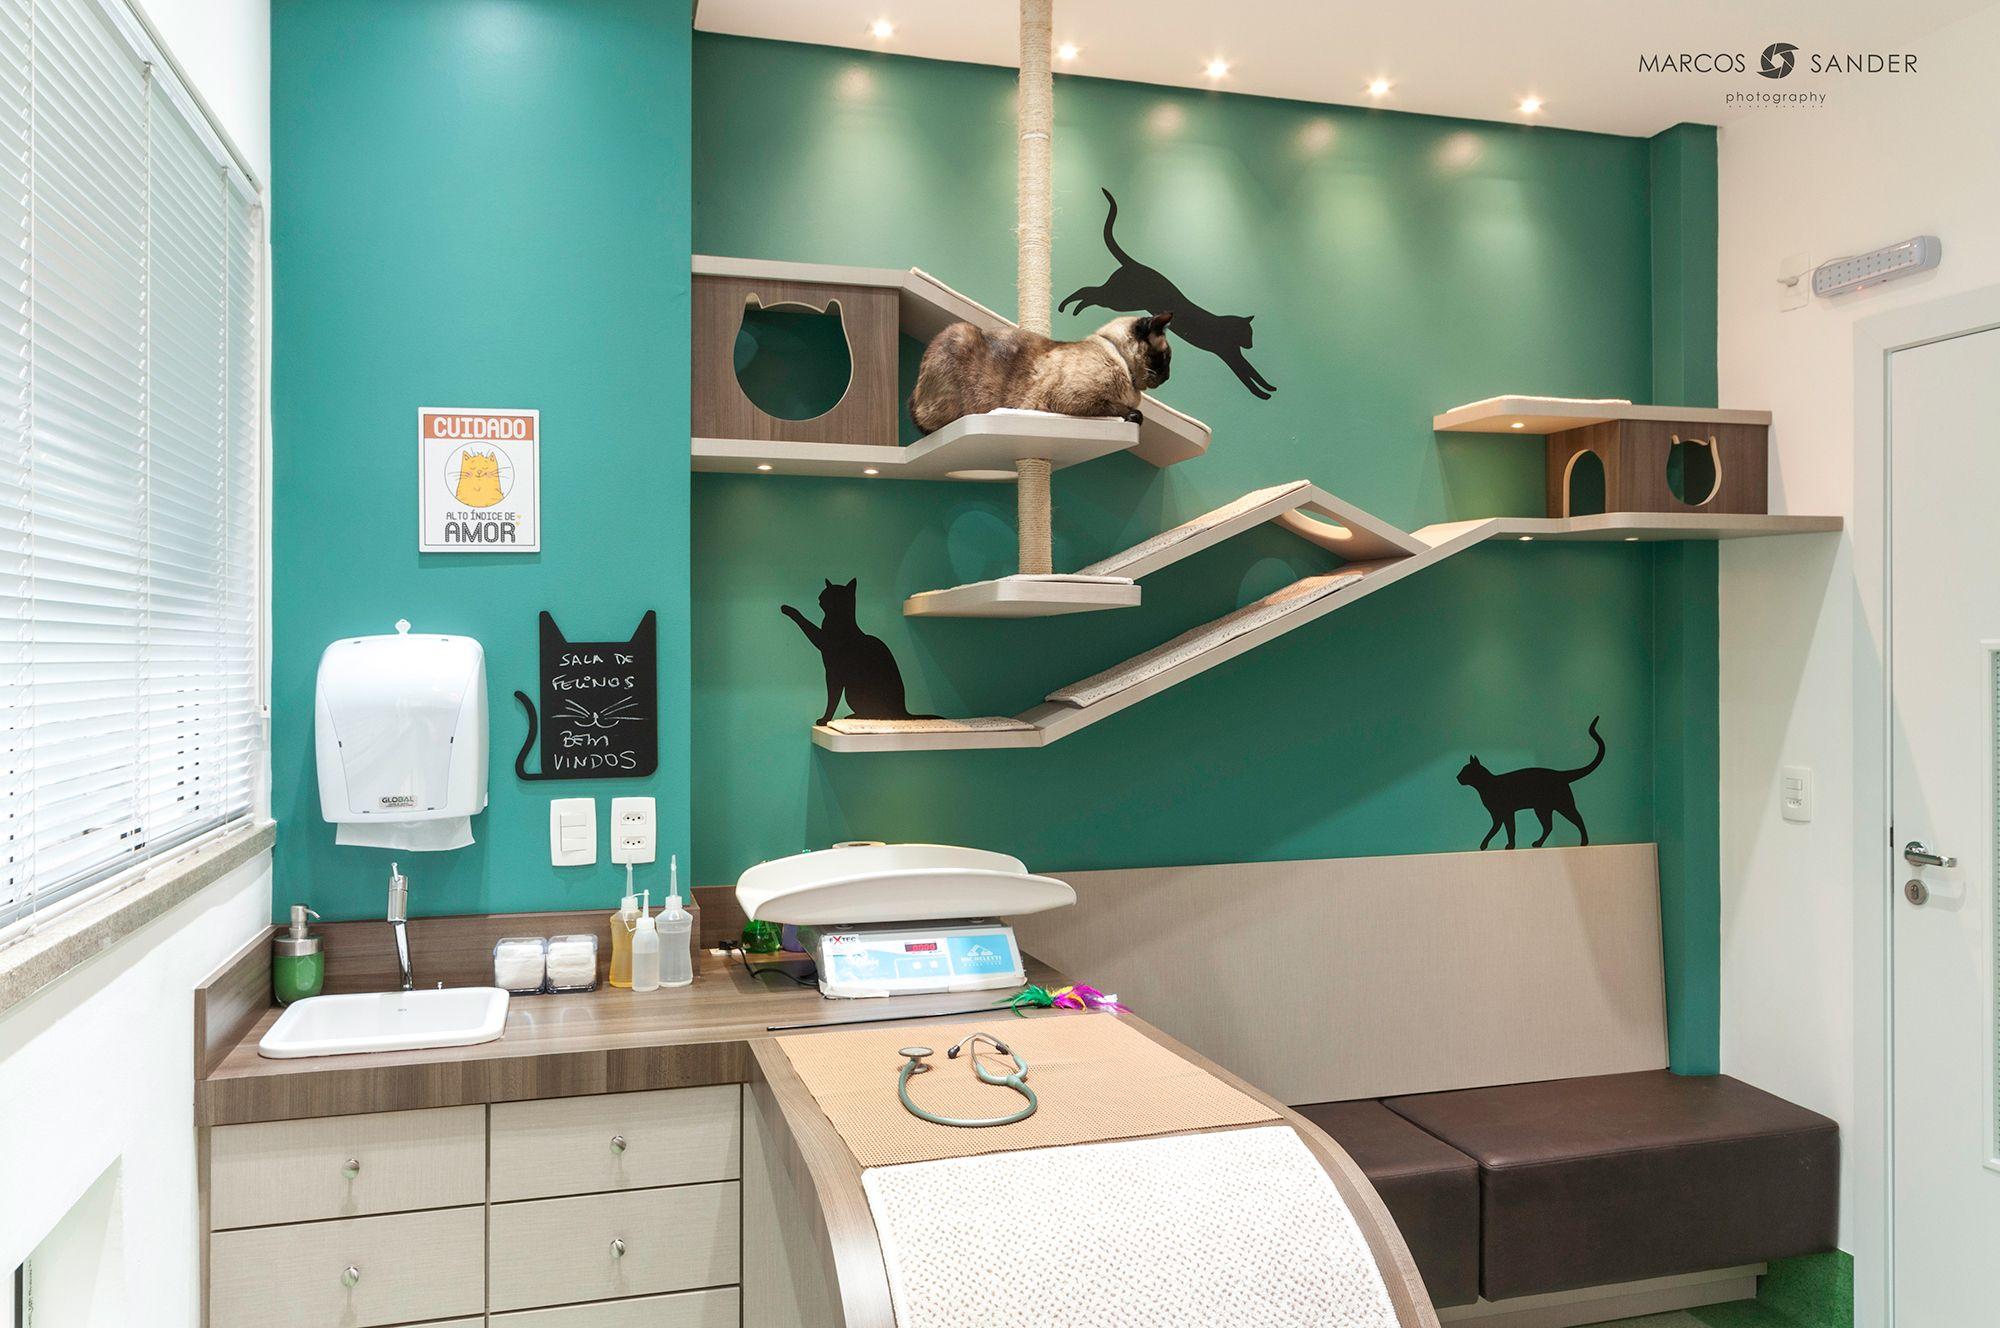 19+ Four corners animal hospital ideas in 2021